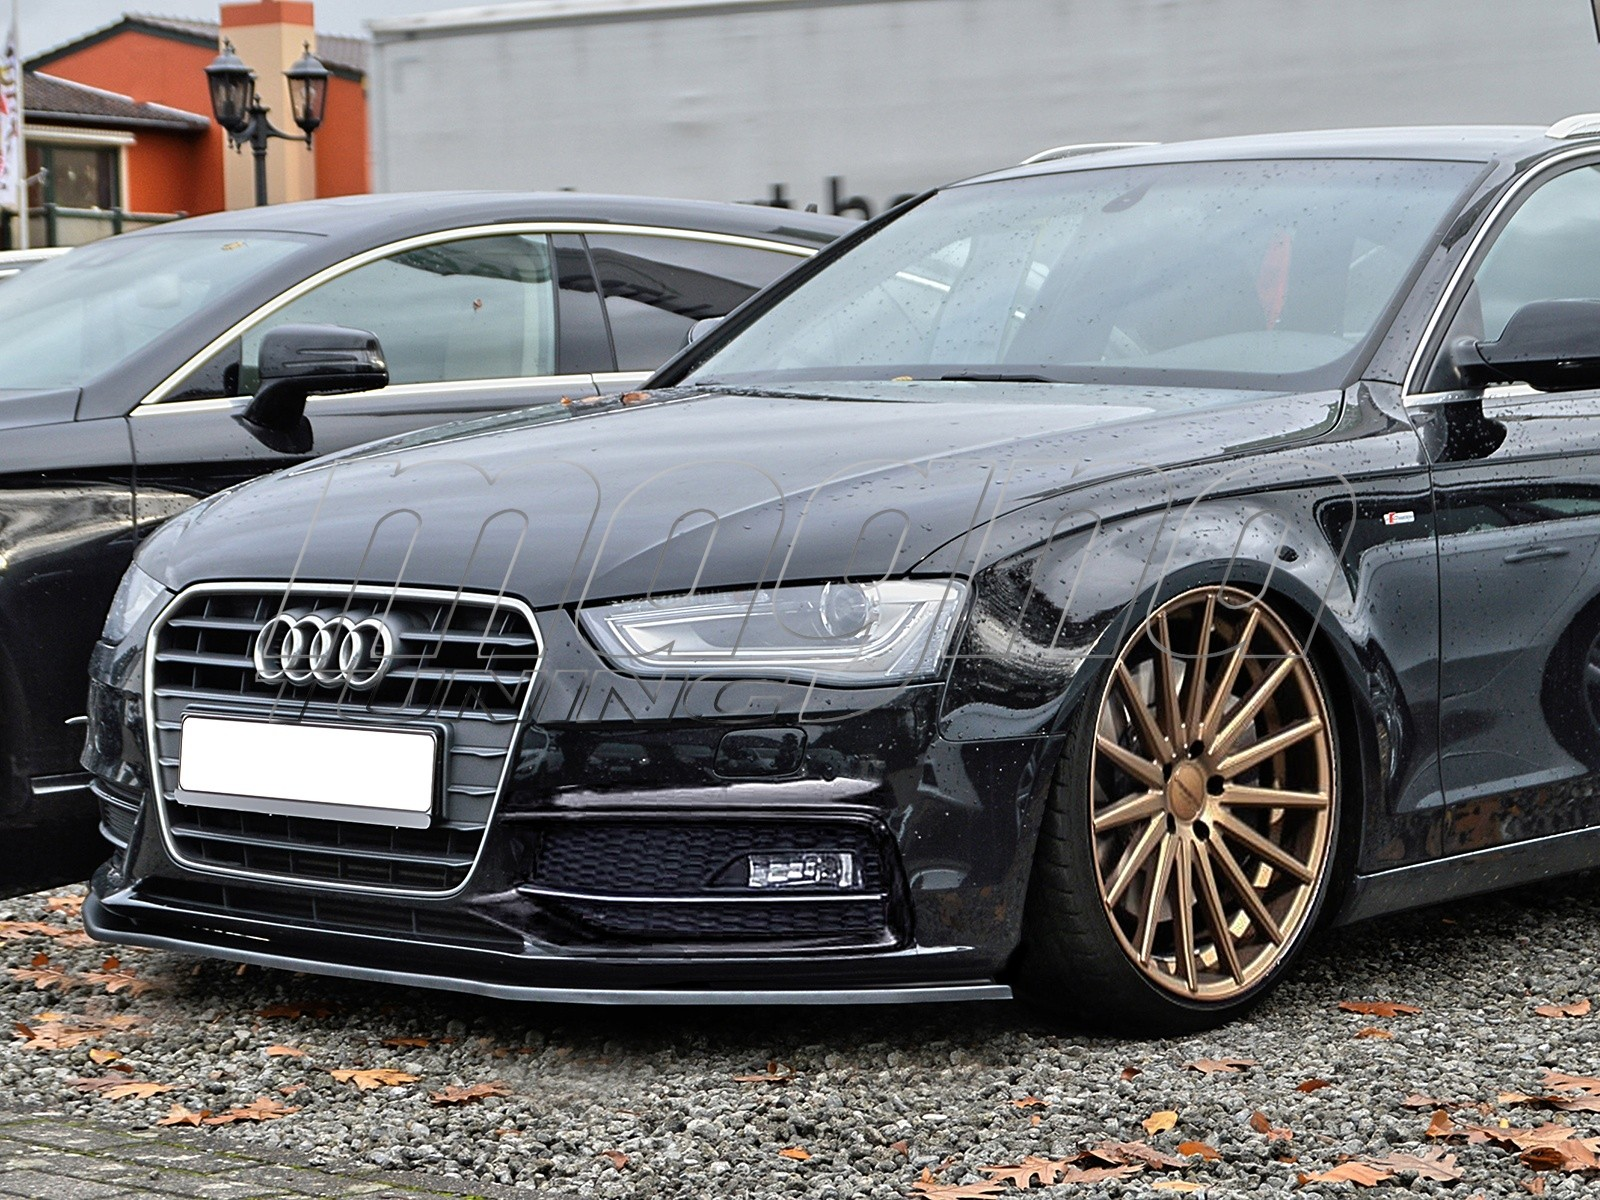 Audi A4 B8 8k Facelift S Line Intenso S Front Bumper Extension